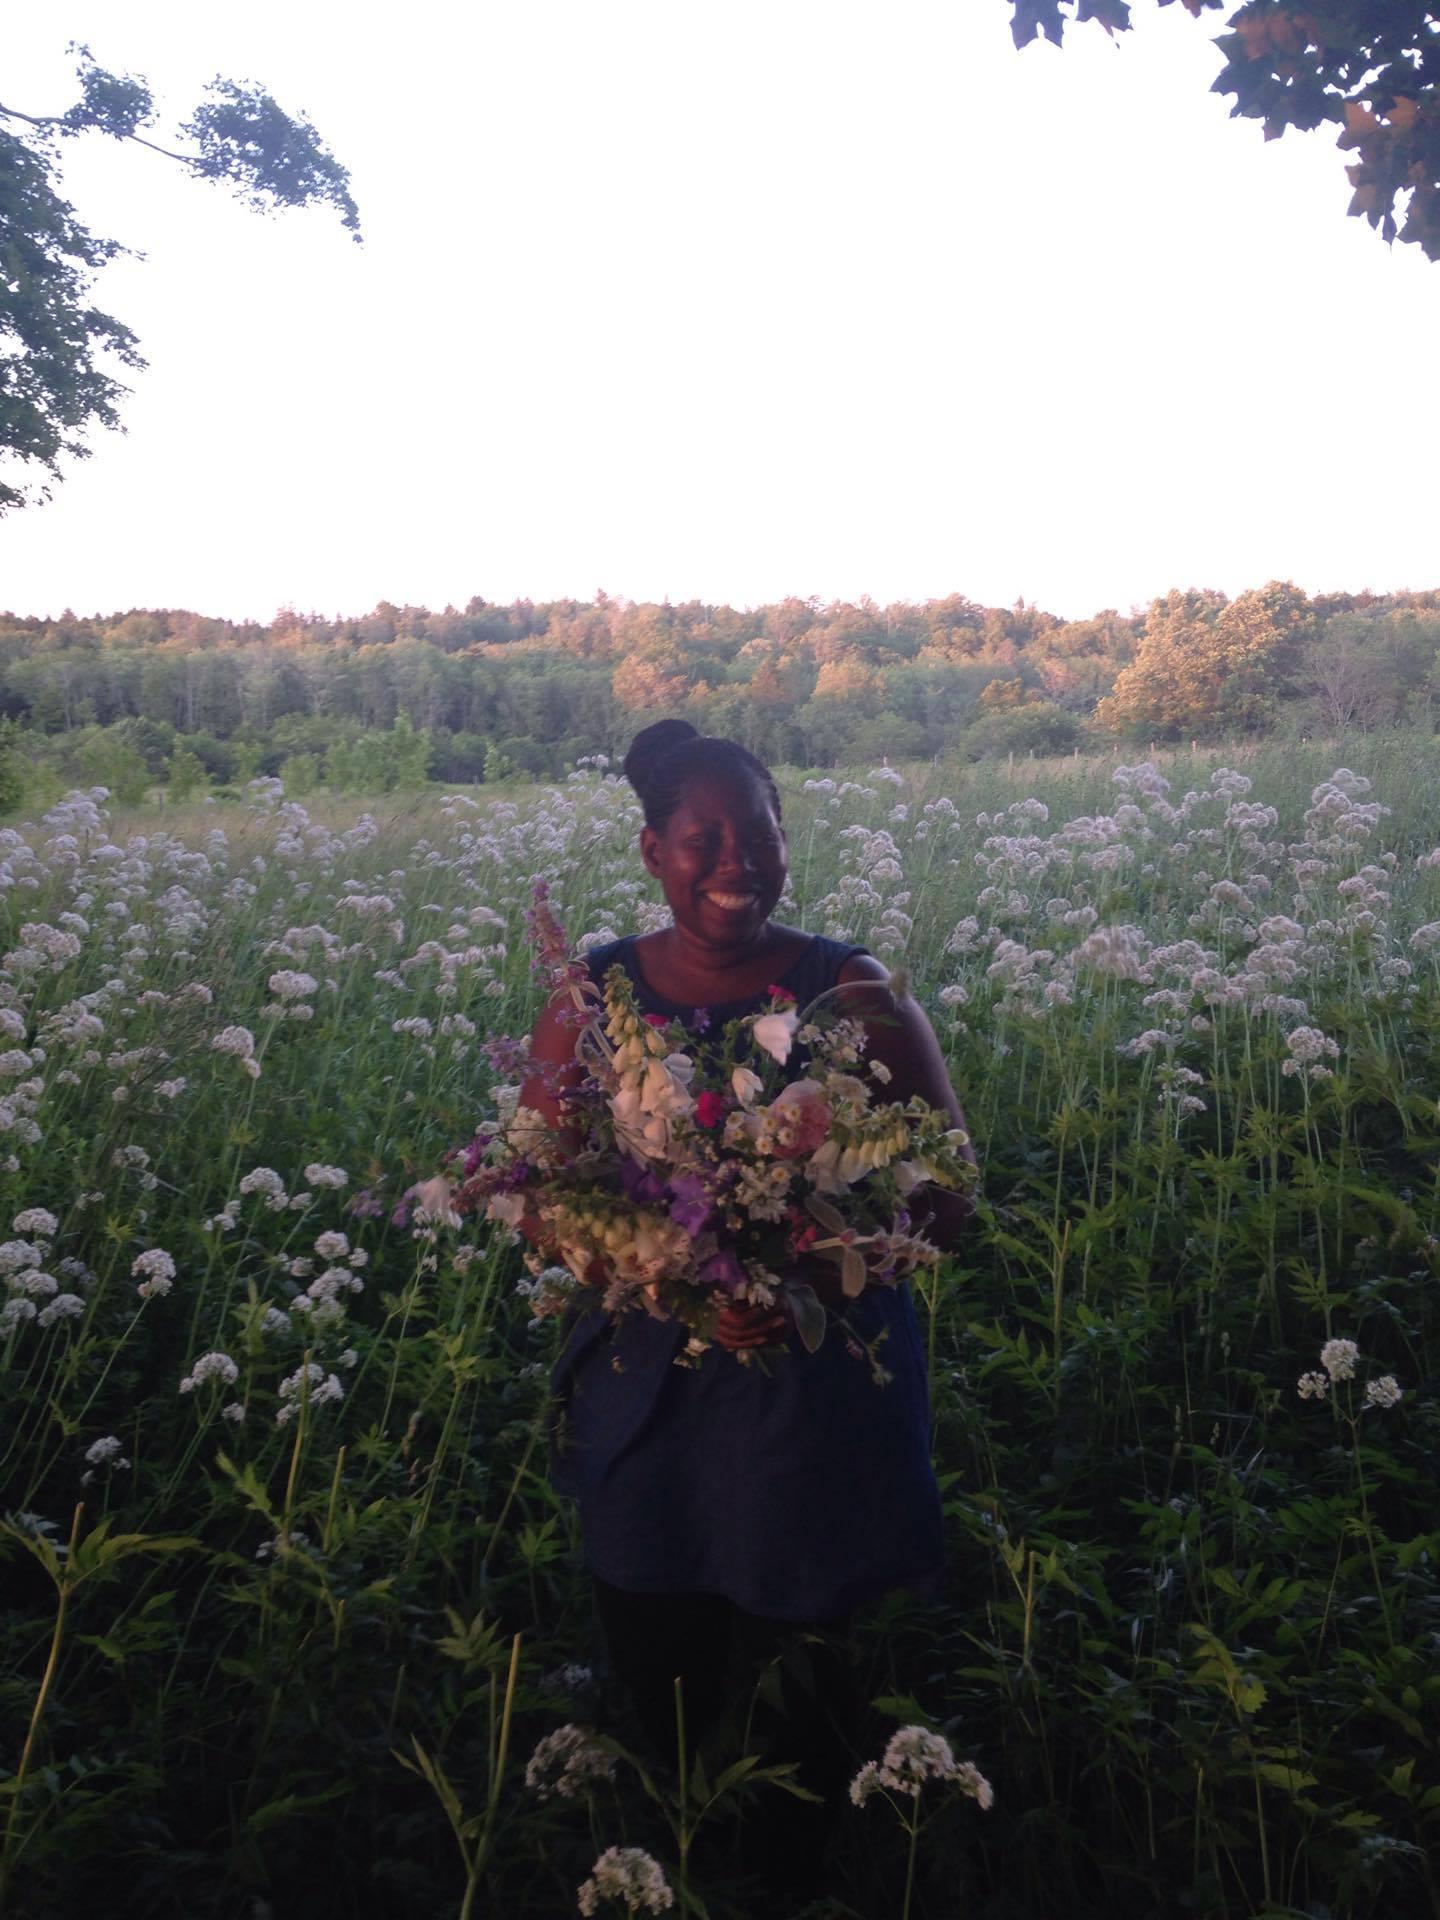 Halifax bouquet subscription / flower CSA 2018. Luxury hand-tied farm fresh flowers. Hedgerow Flower Company, Nova Scotia, Canada.